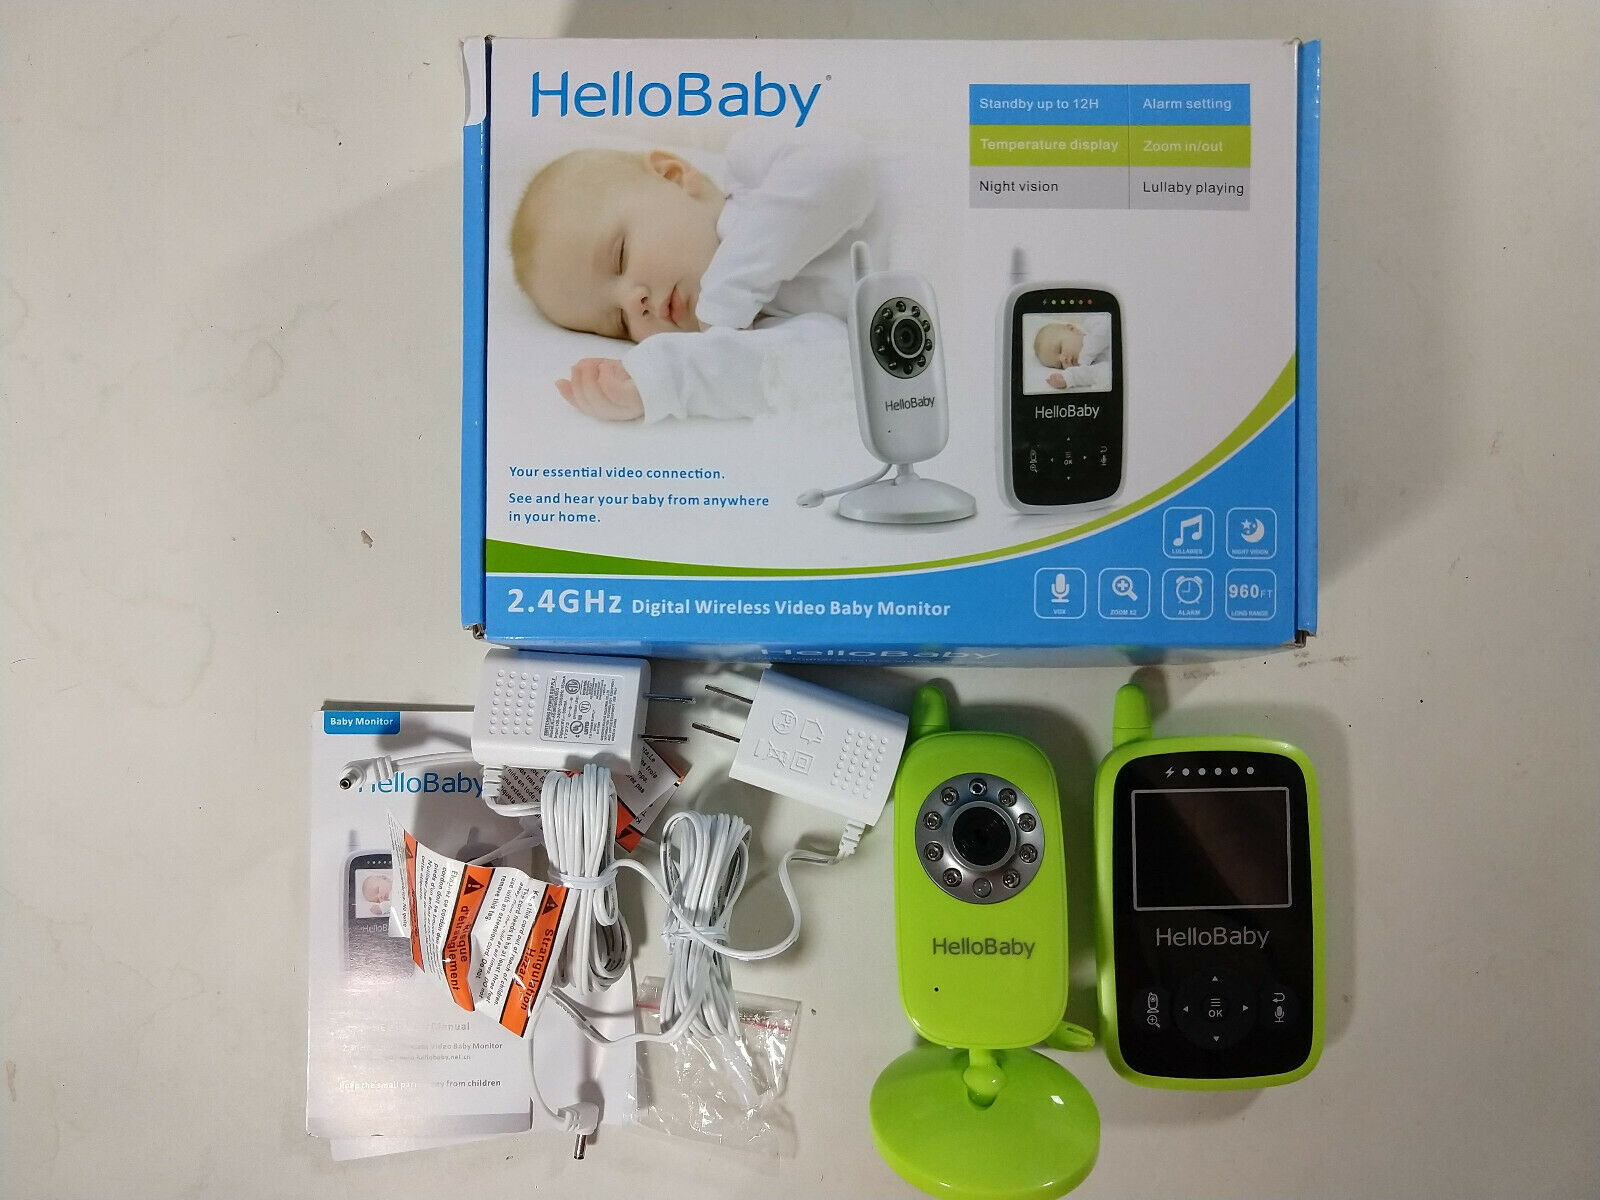 HelloBaby Baby Monitor 2.4Hz Digital Wireless, Night Vision